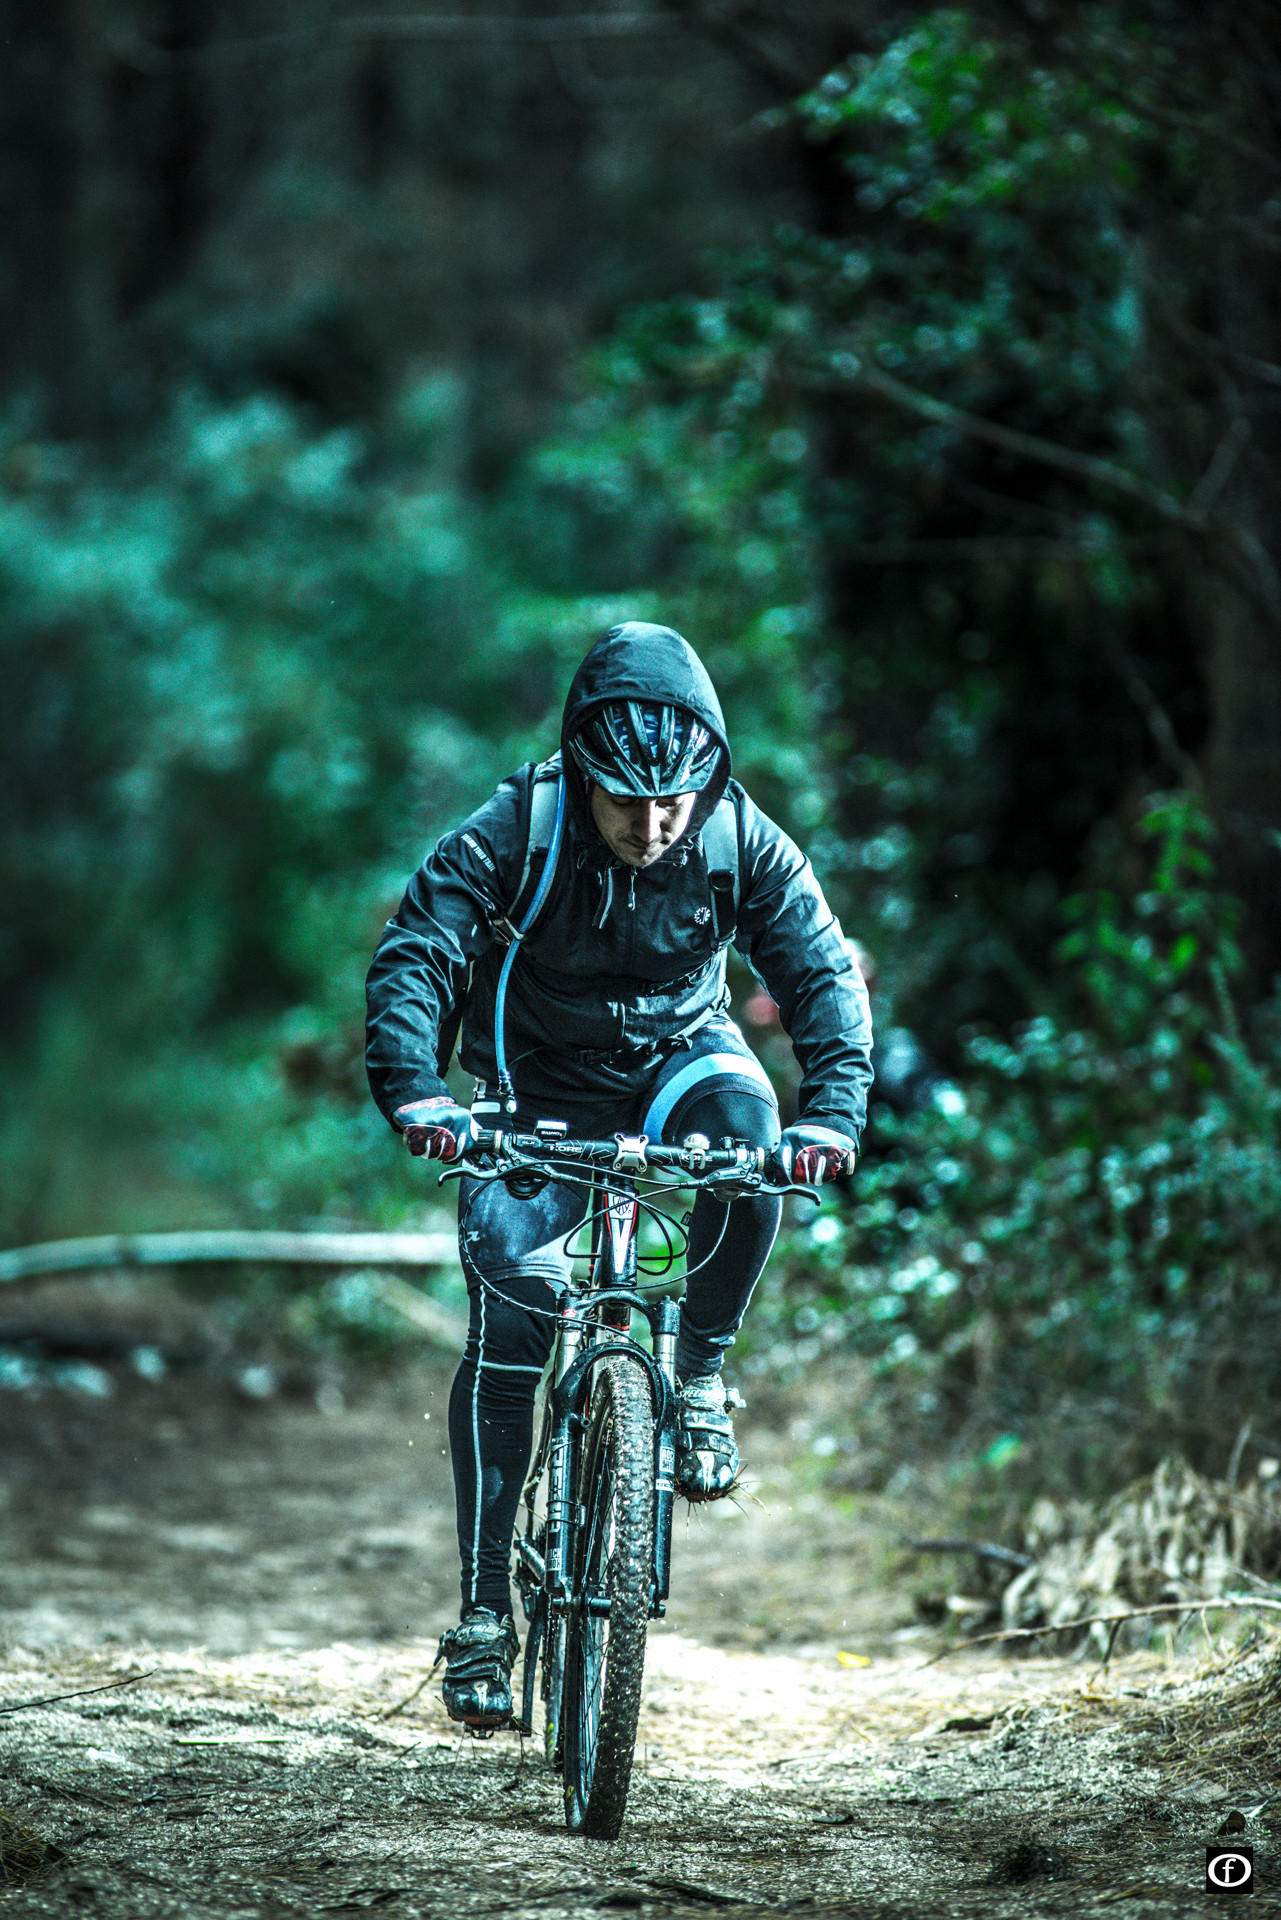 2015-05-17-Ciclismo Enduro-63.jpg